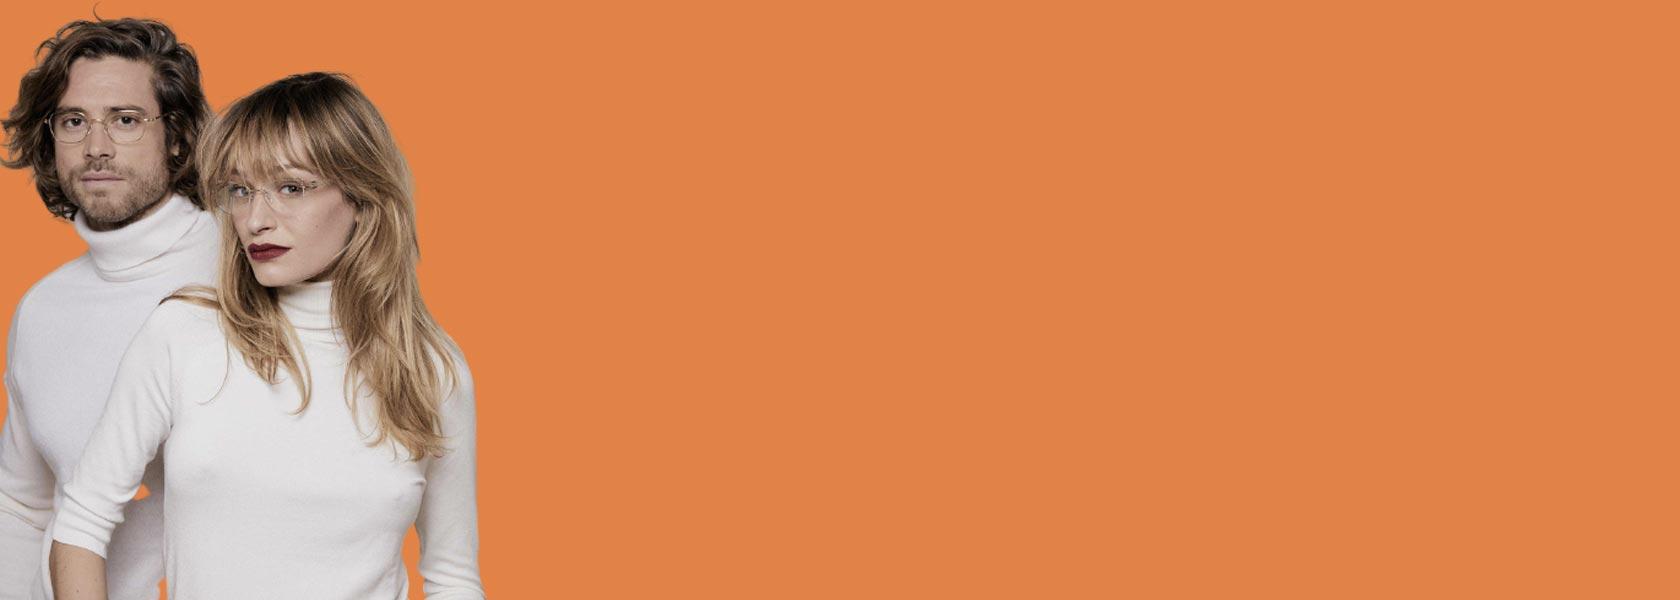 slider-charmant-z-fond-orange